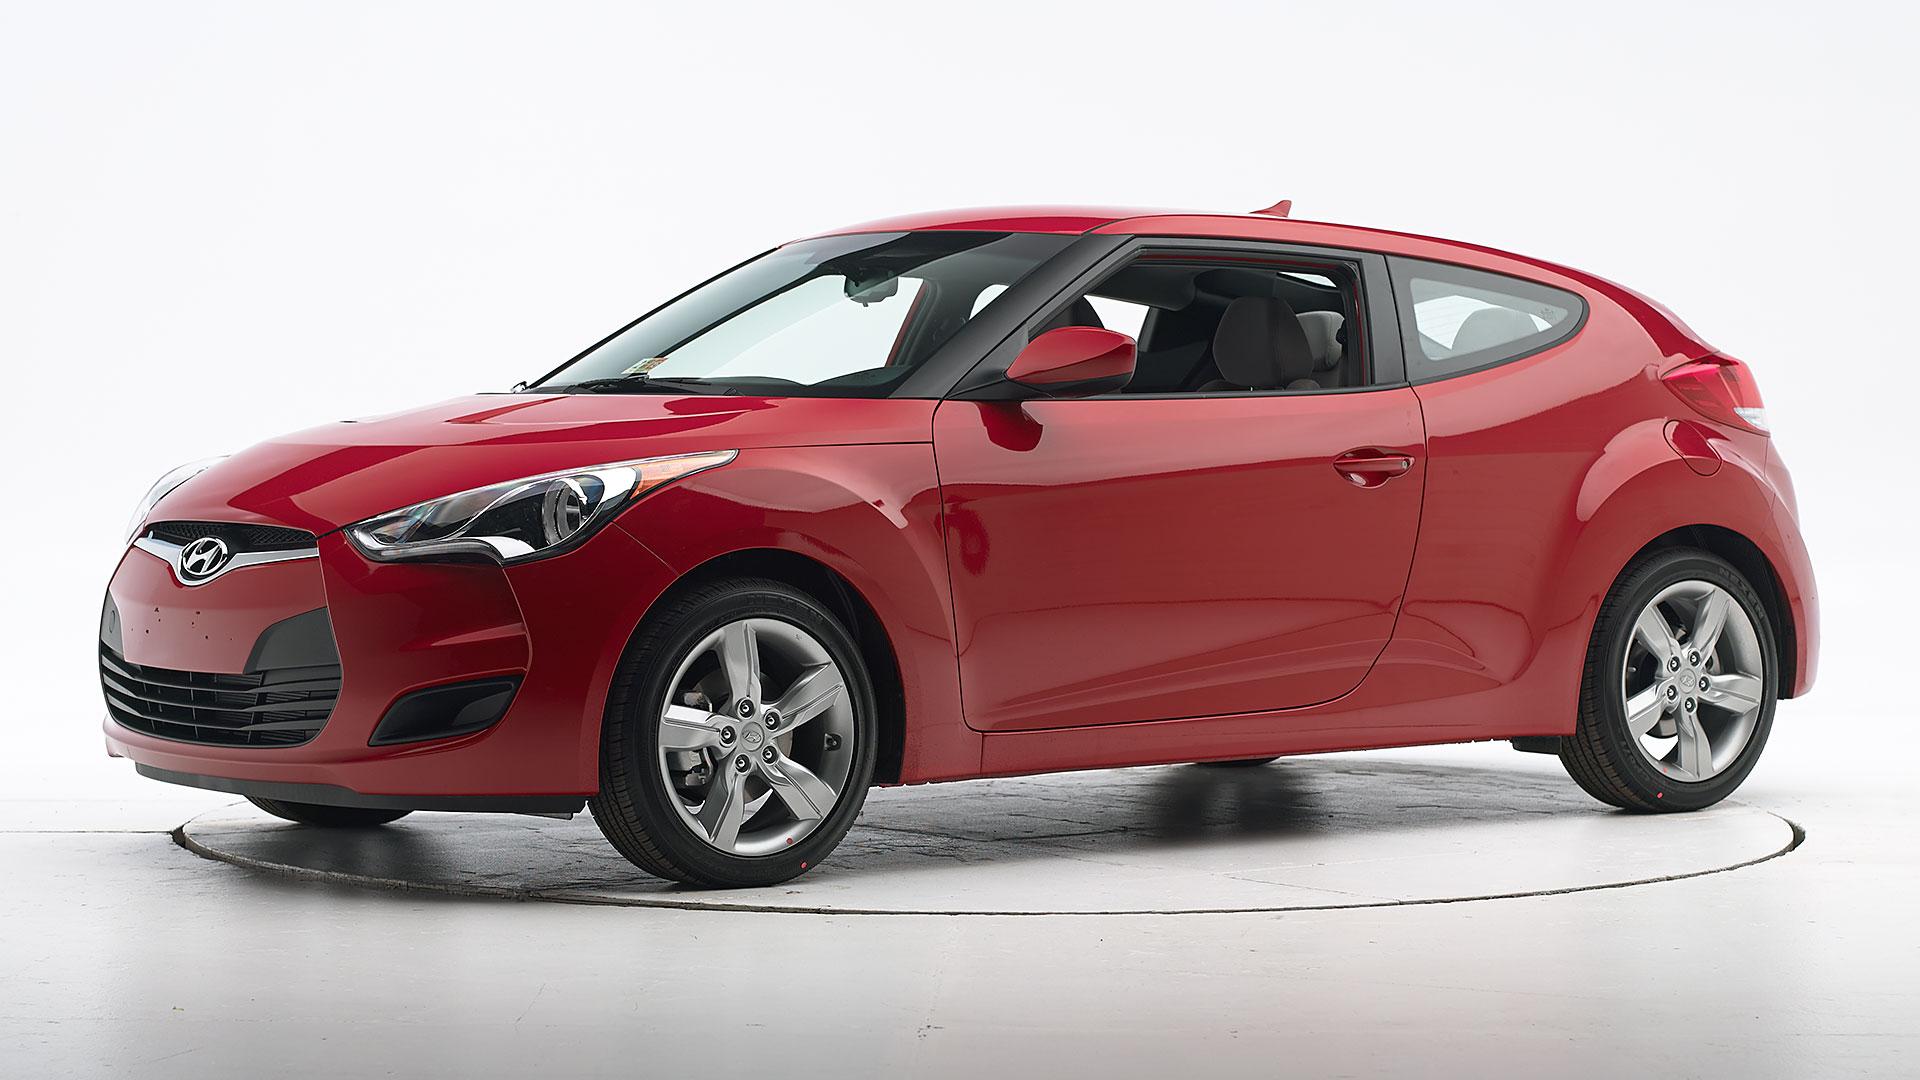 2014 Hyundai Veloster | Hyundai Two Door Car |  | IIHS